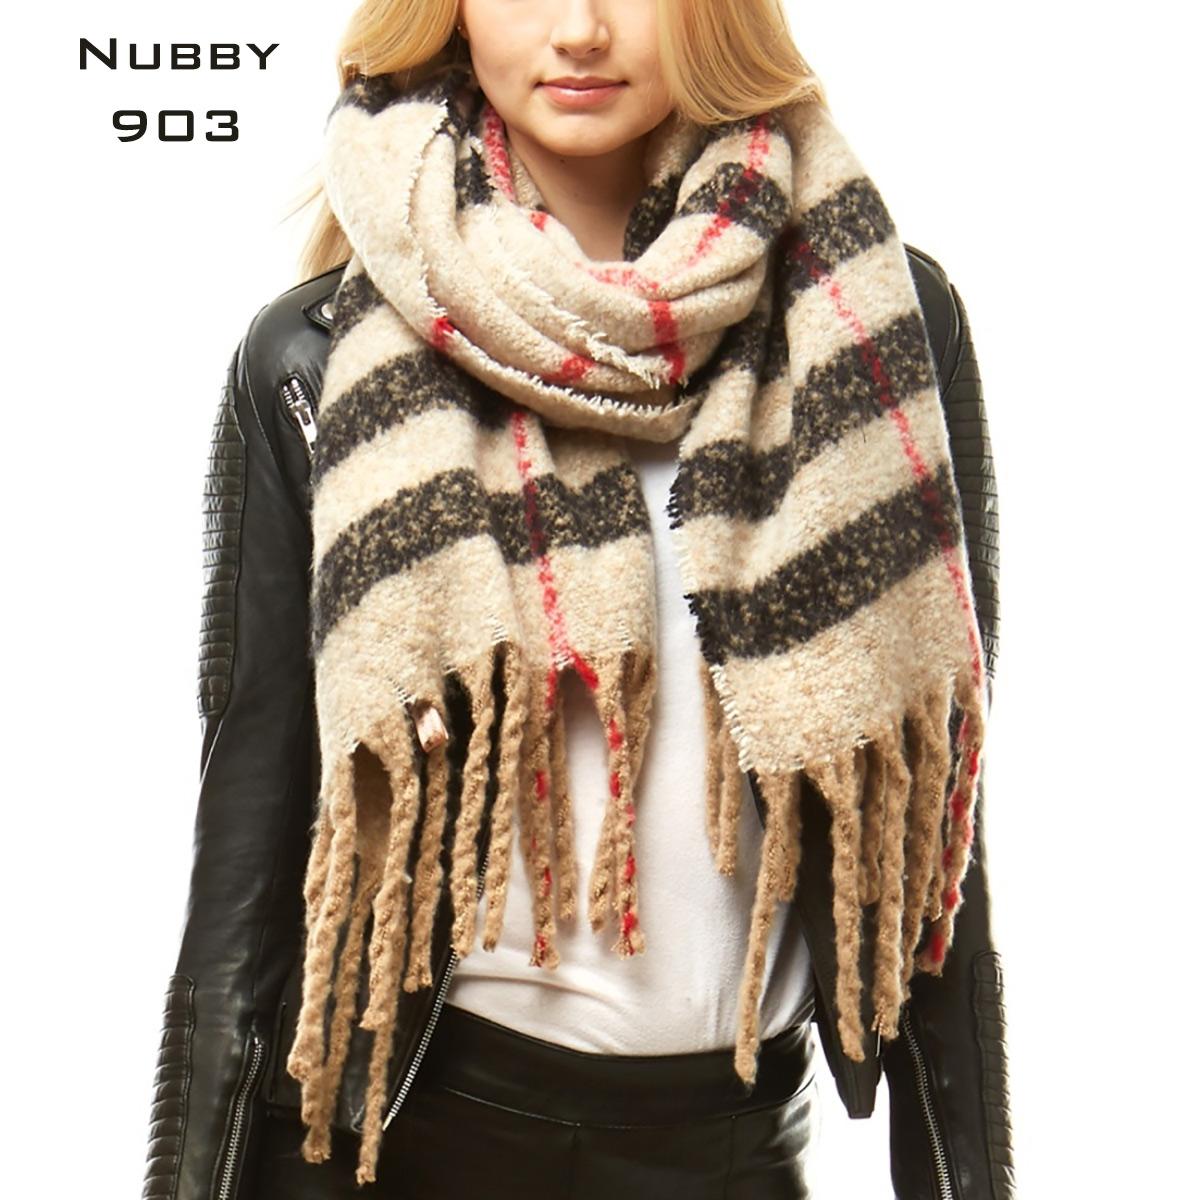 Winter Nubby Weave Oblong Scarves - 903